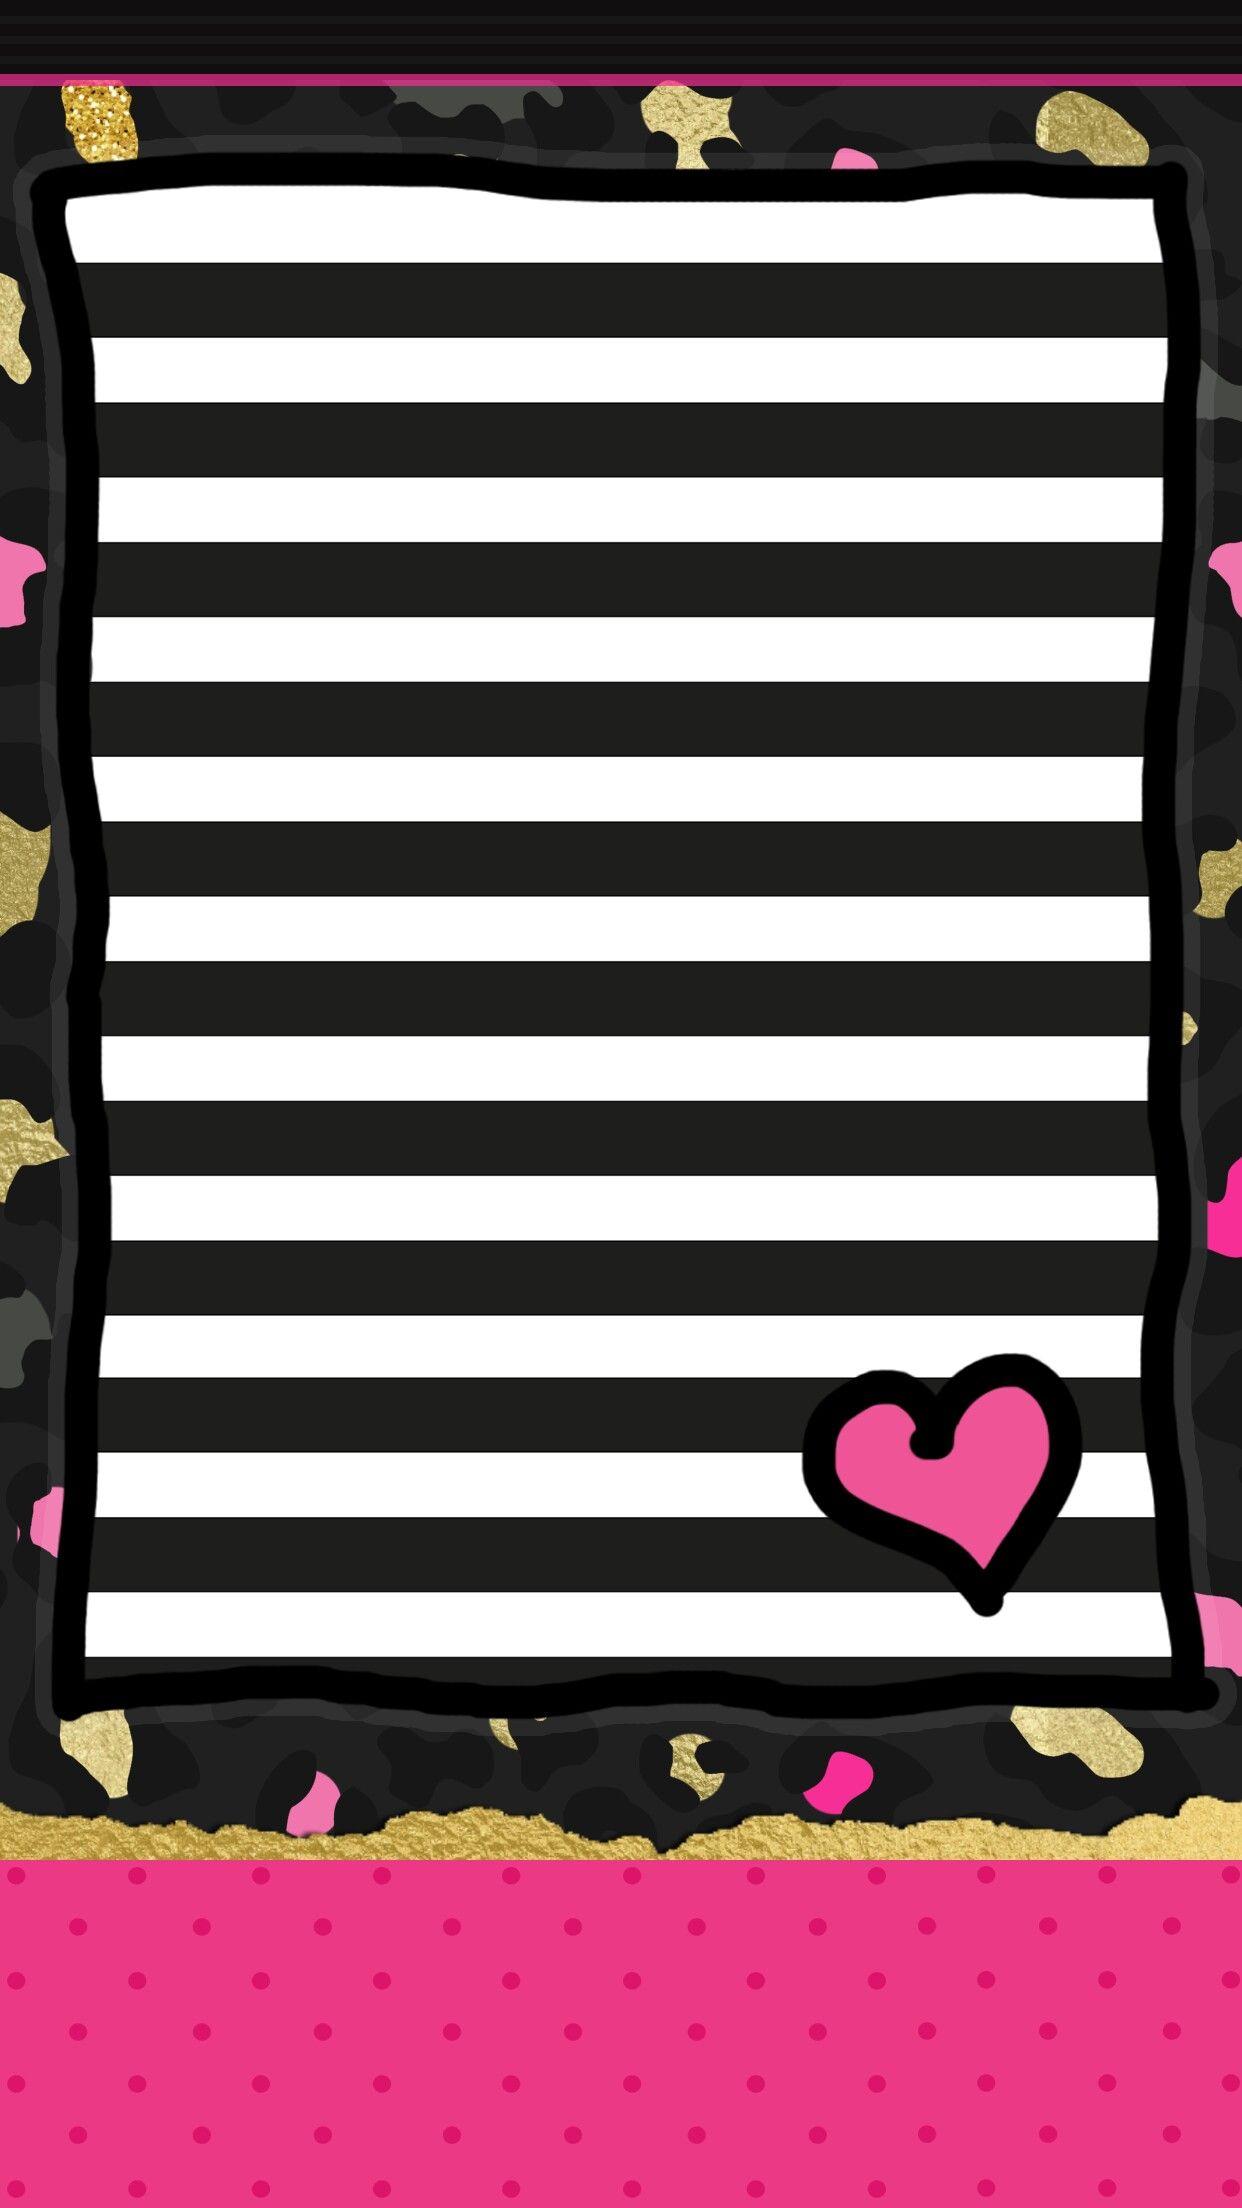 Wallpaper Iphone Wallpaper Glitter Chevron Wallpaper Heart Wallpapero Kitty Wallpaper Love